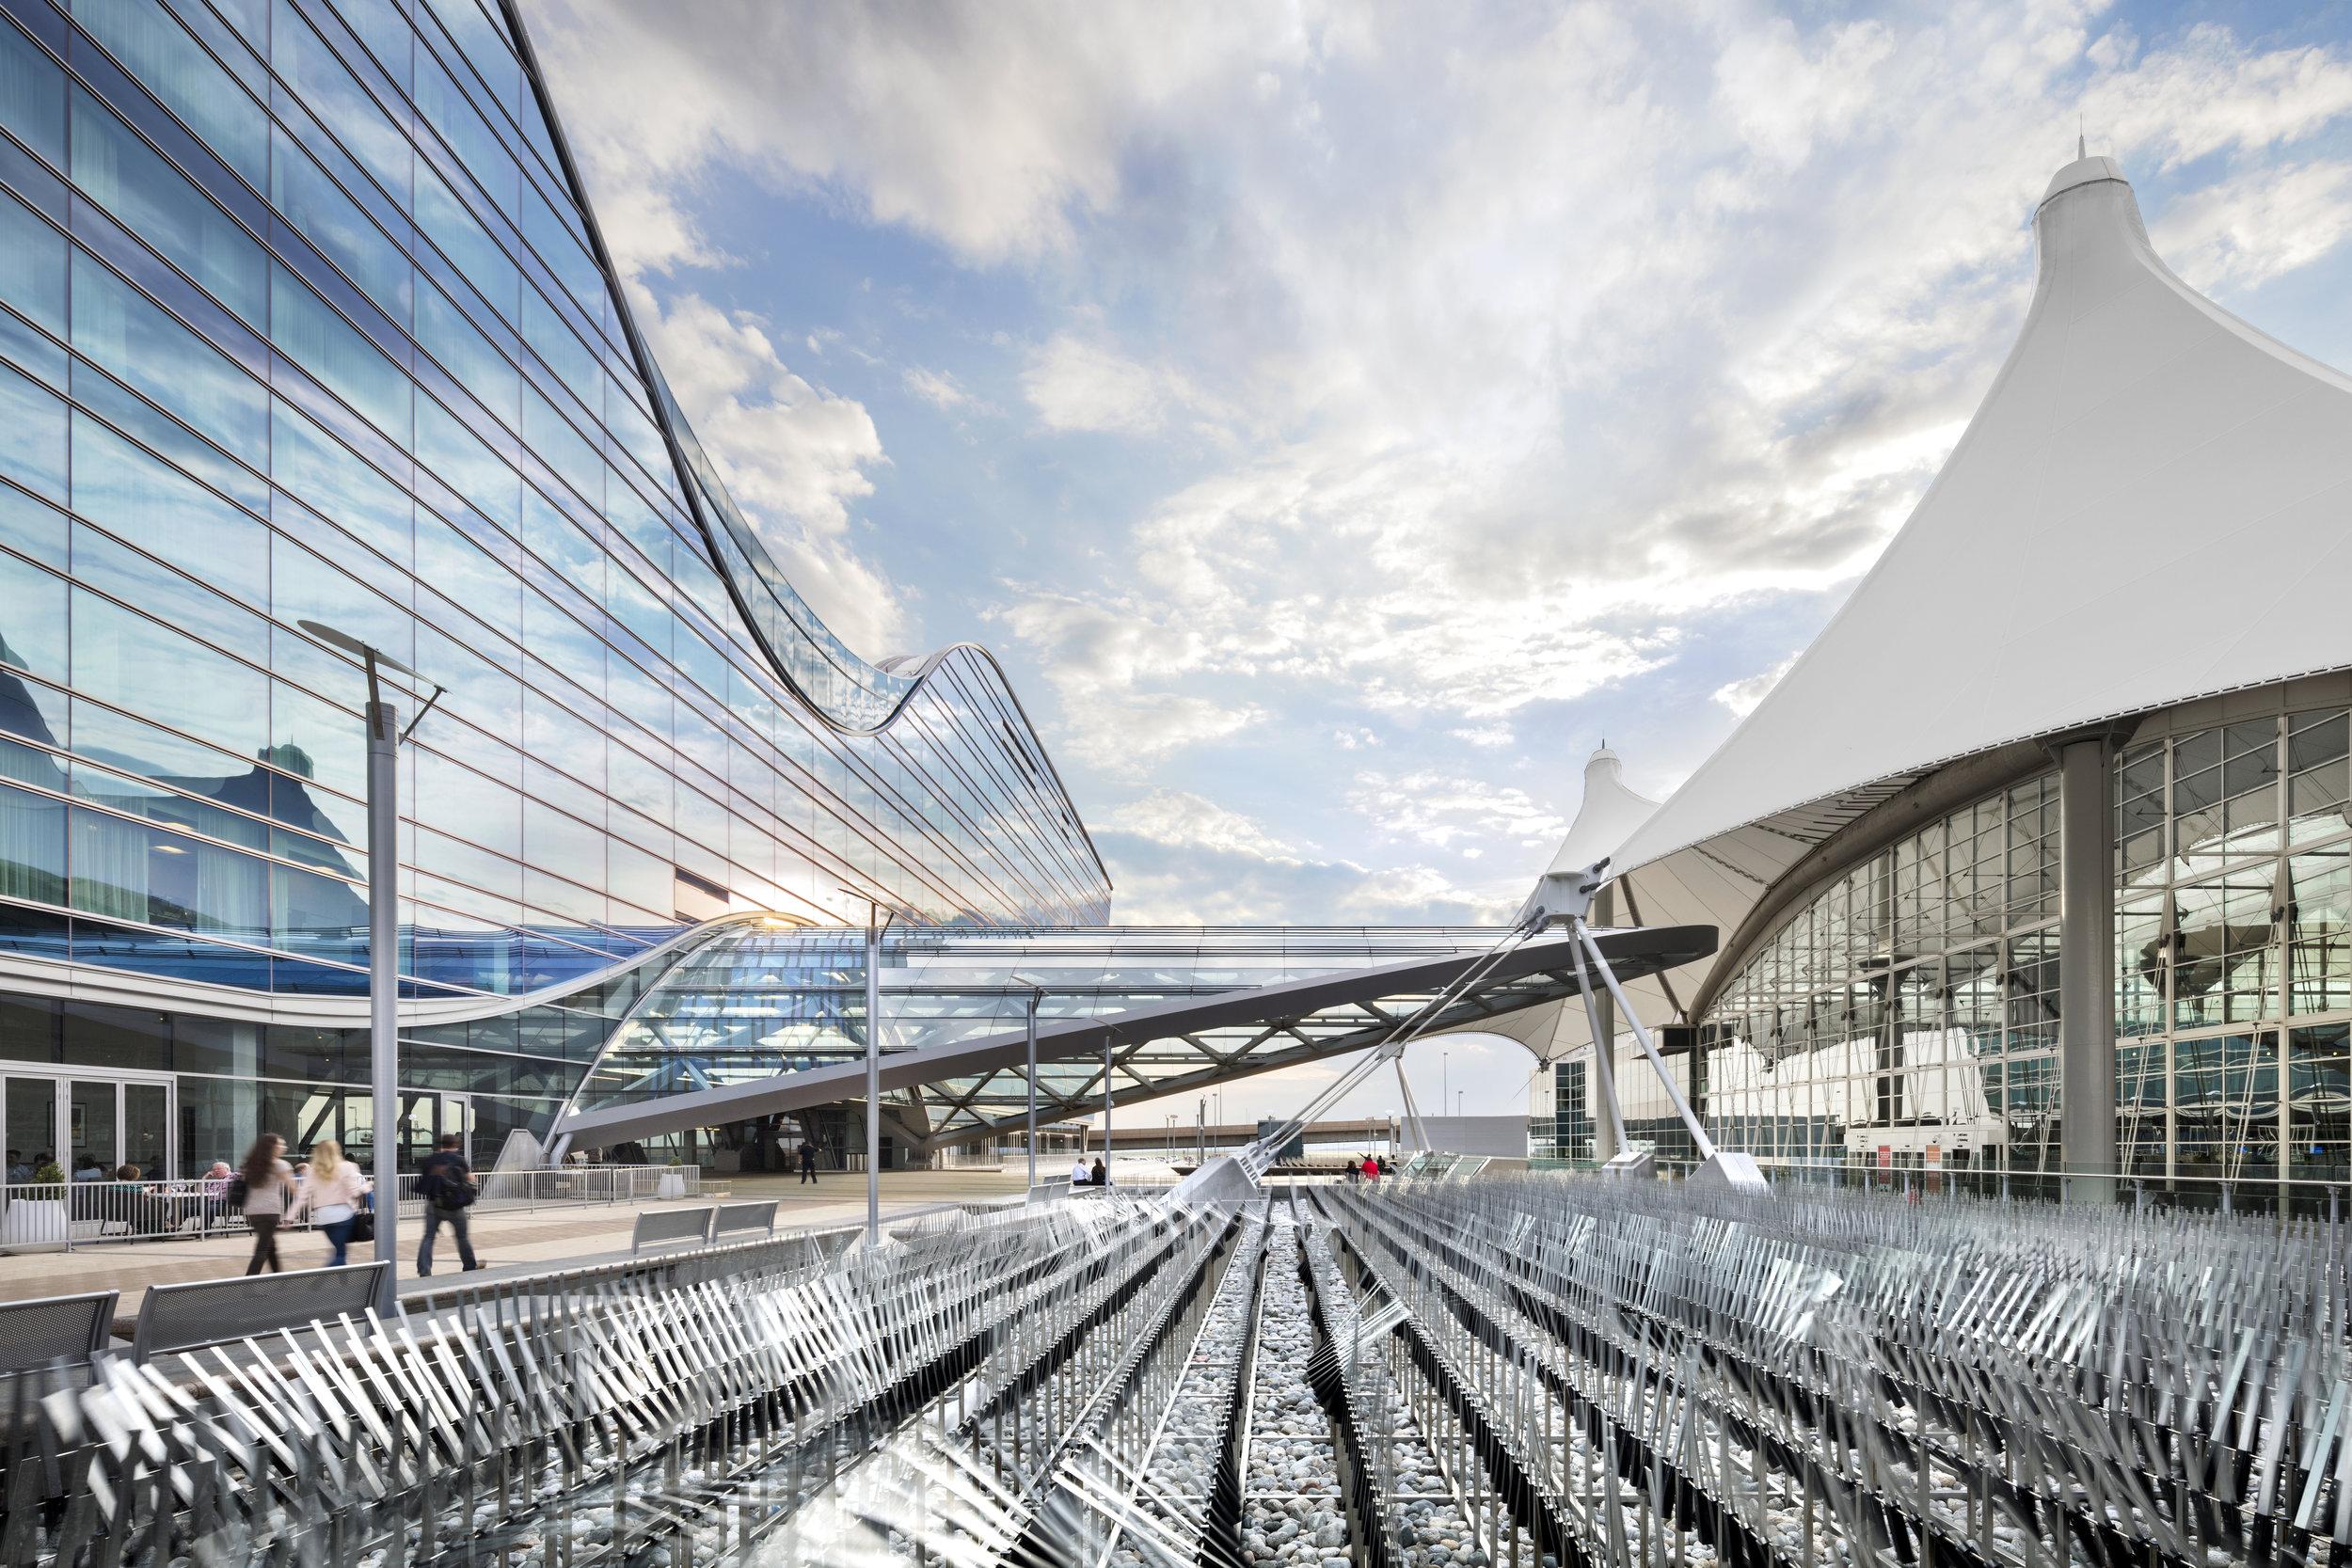 "<img src="" studioINSITE_WestinDEN_Plaza_Artistic Element ""alt=""Denver International Airport, DIA, Denver, CO, Colorado, Airport, Art, Hotel, Transit, Light Rail, Events, Arts, Sculpture, Plaza, Transportation, Terminal, Hub  ""title=""Denver International Airport - Westin Hotel Plaza  ""/>"